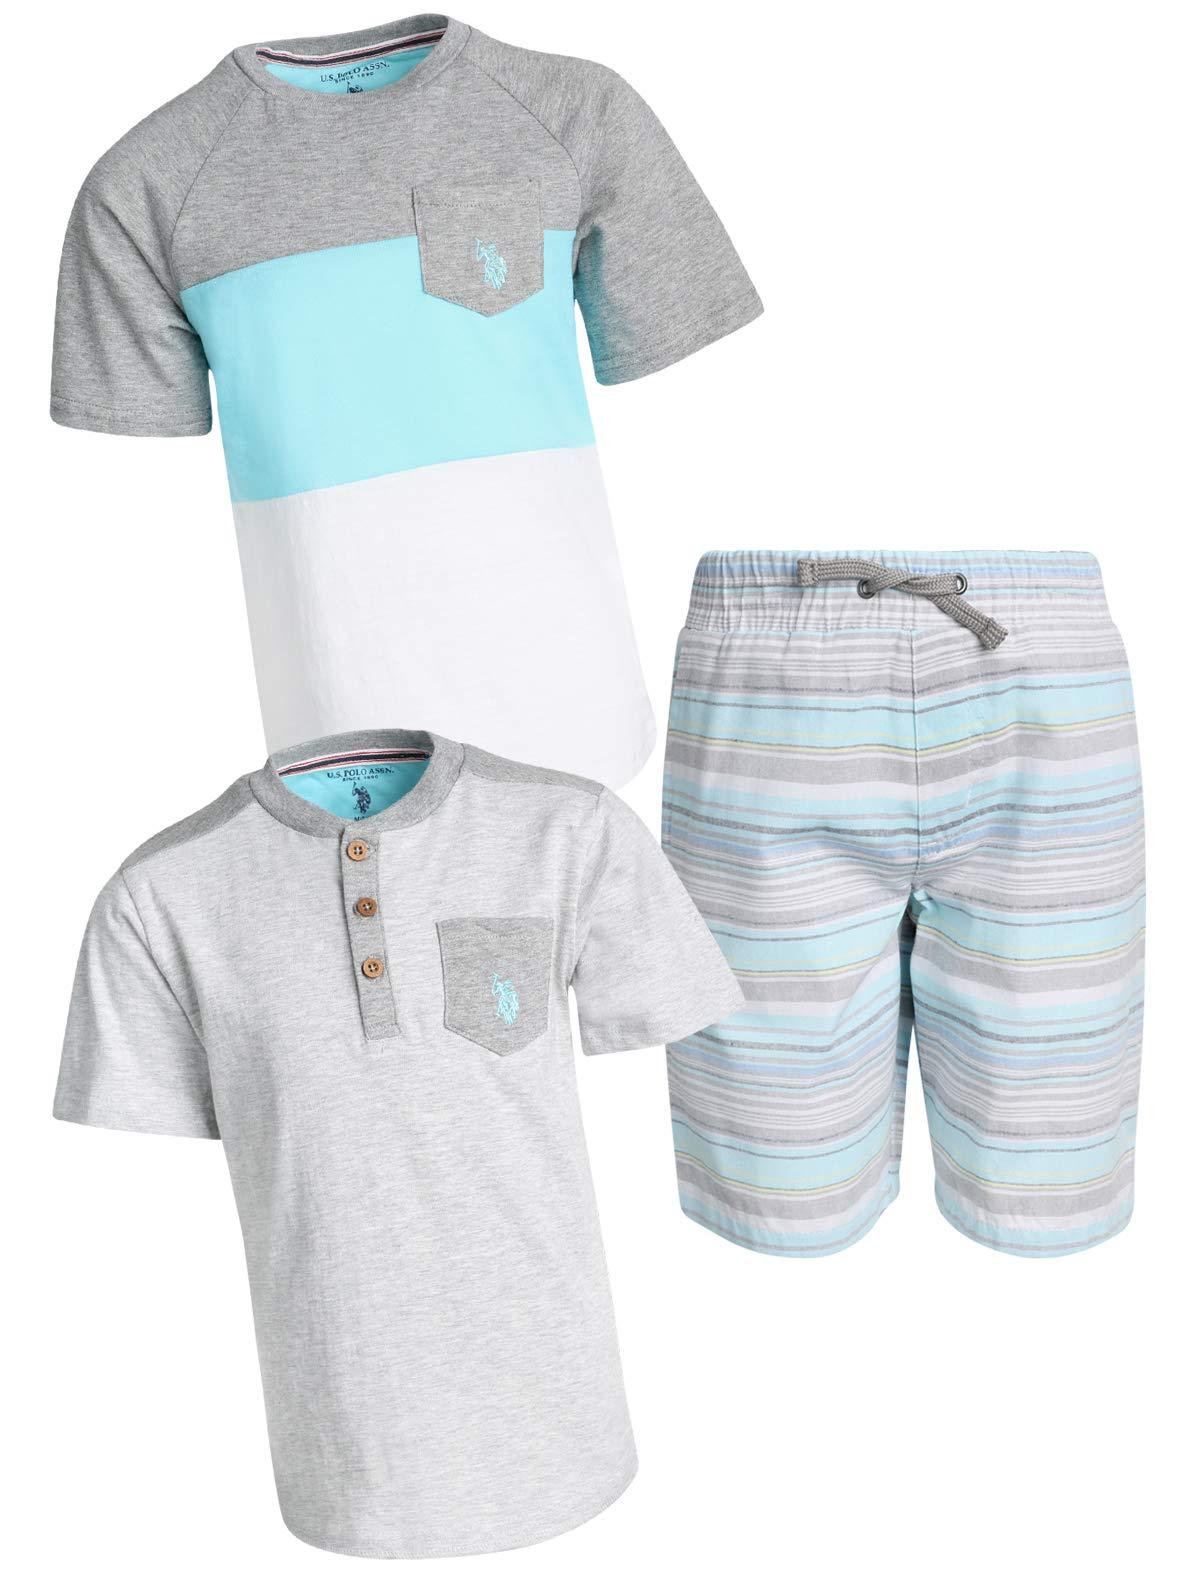 'U.S.Polo Assn. Boys' 3 Piece Stylish Knit Tops and Shorts Set, Stripe/Grey, Size 5/6'